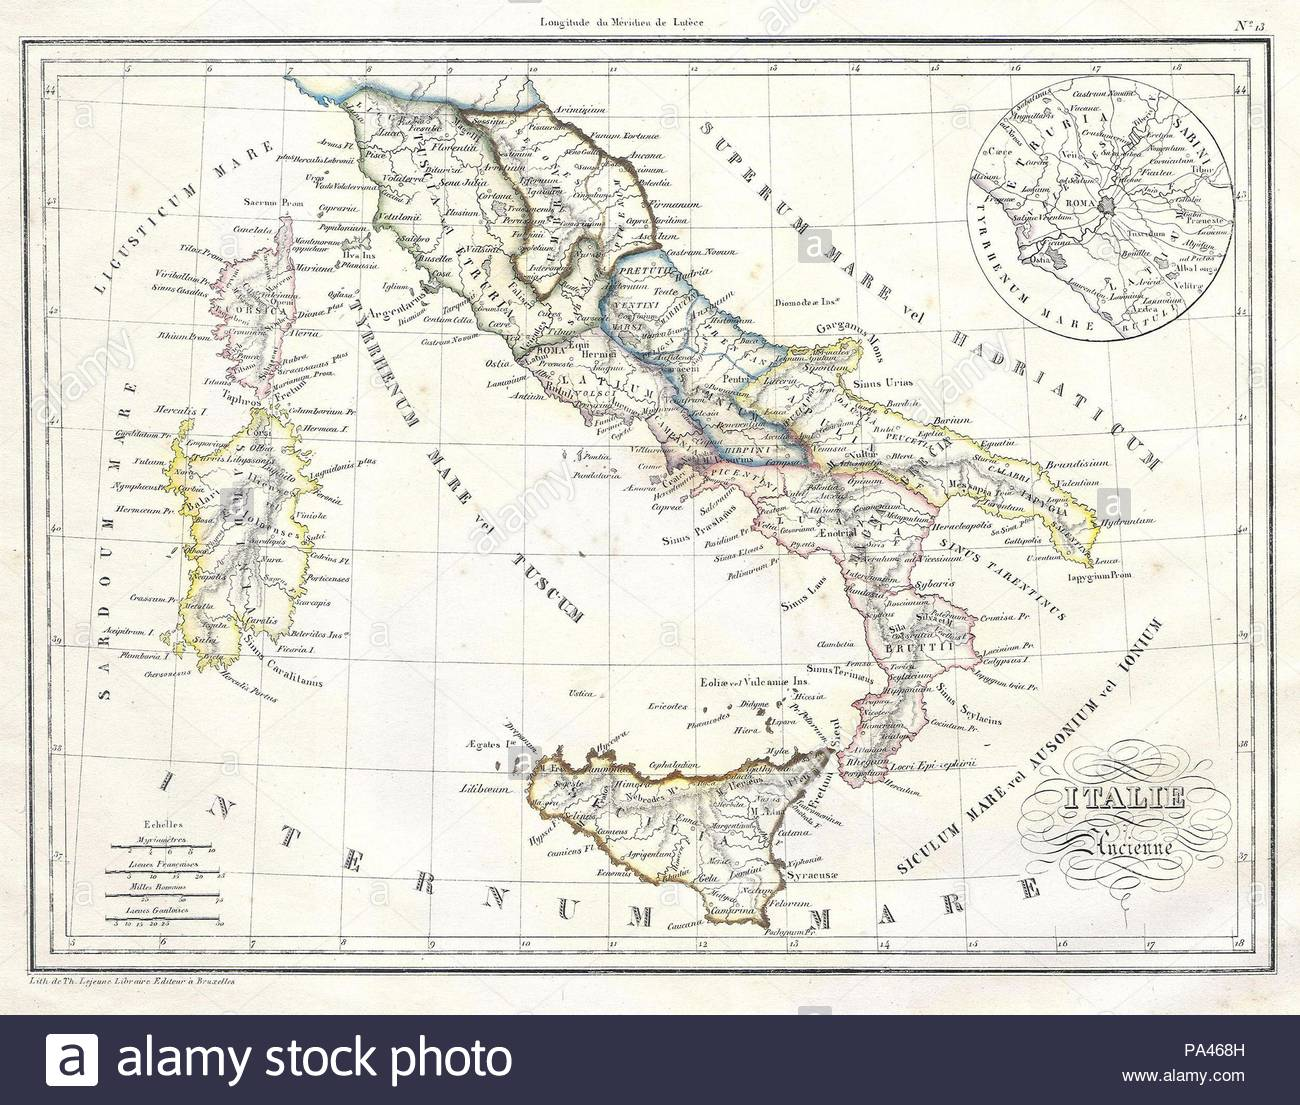 Malte Brun Map Of Italy In Ancient Roman Stock Photos Malte Brun